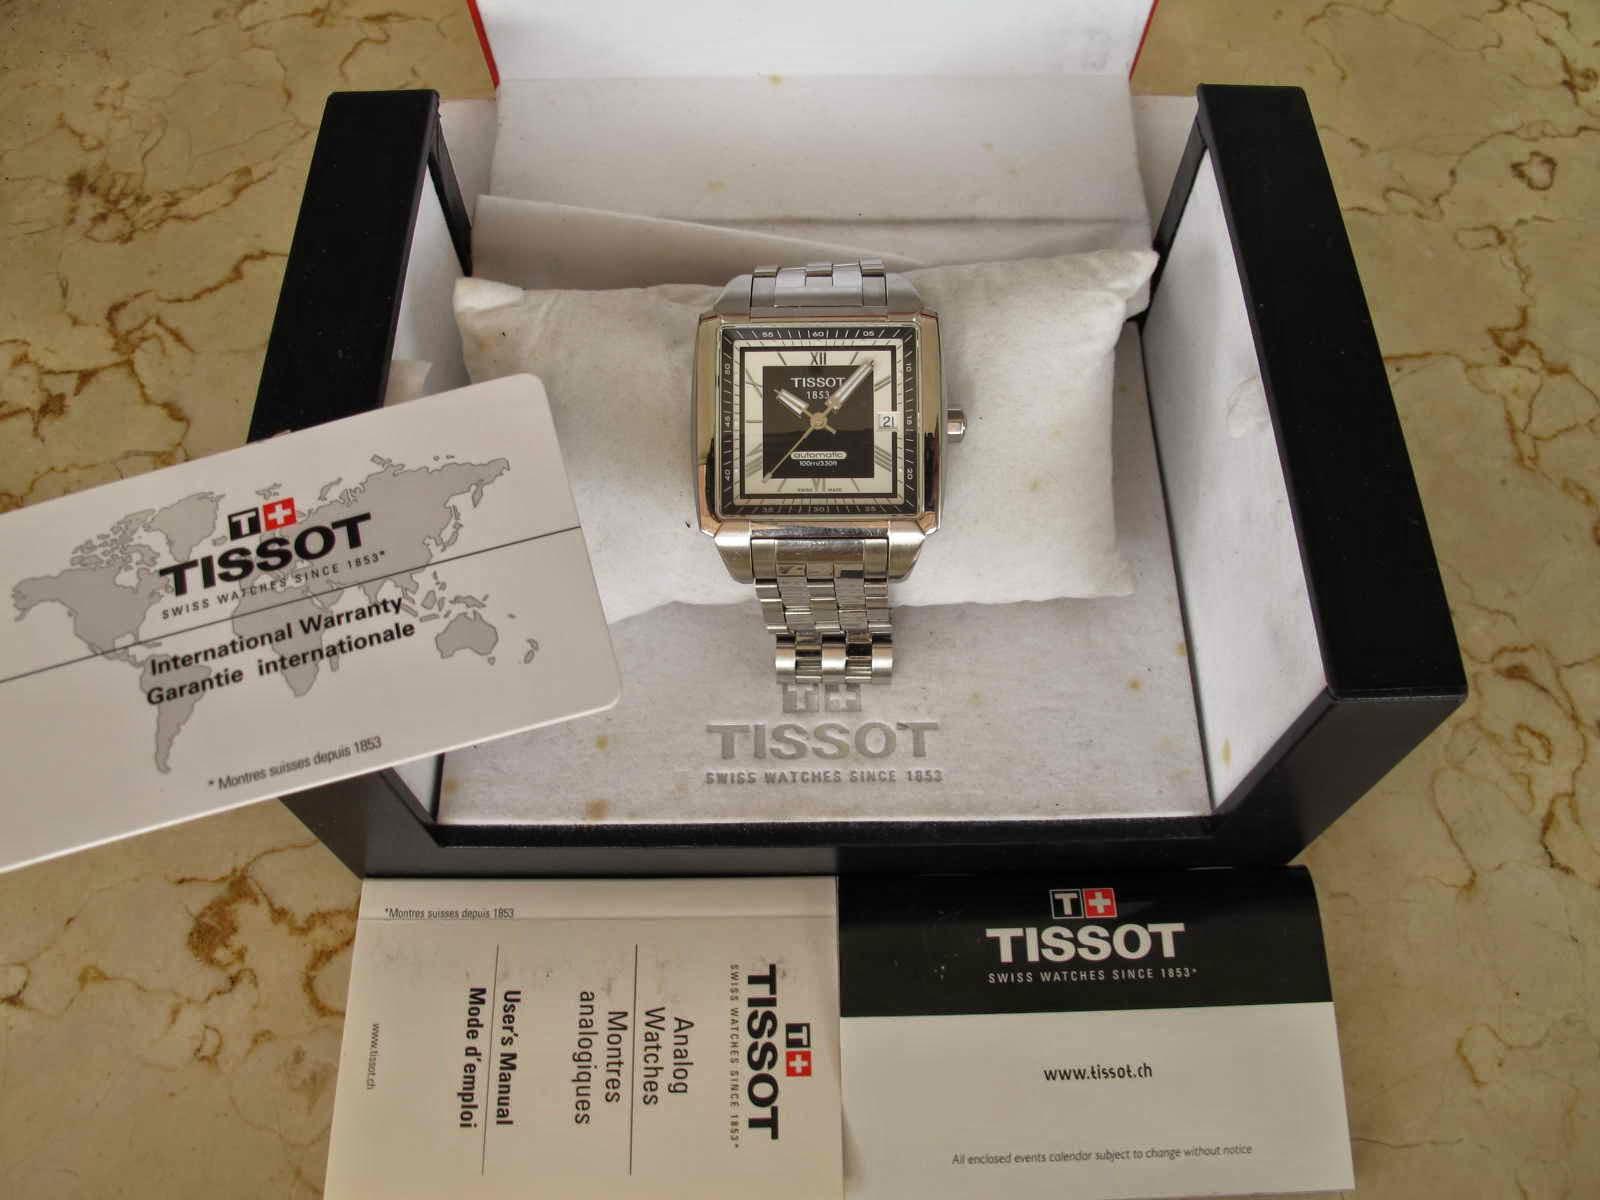 Cocok untuk Anda yang bosan menggunakan jam tangan model seperti biasanya bulat dan mencari model jam tangan dengan bentuk case kotak TV Shape